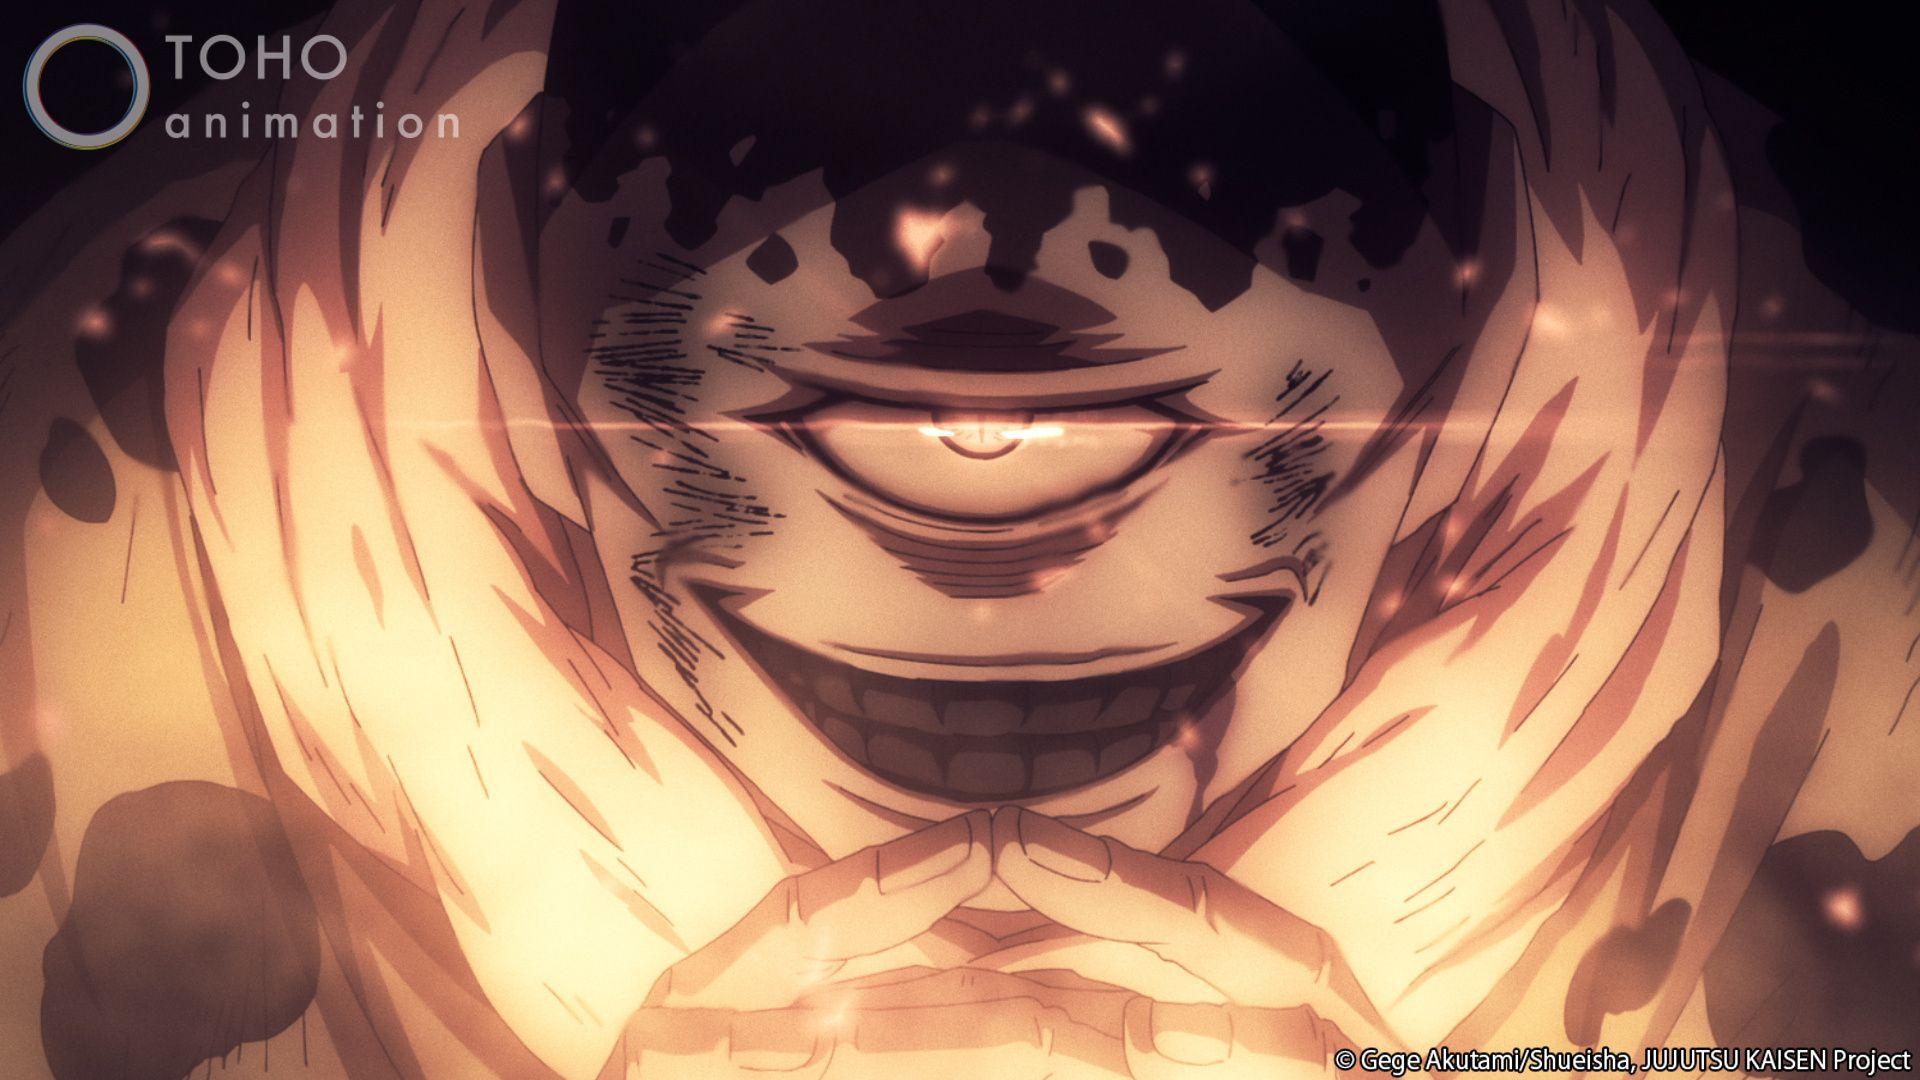 Jujutsu Kaisen On Twitter Anime Jujutsu Anime Wallpaper